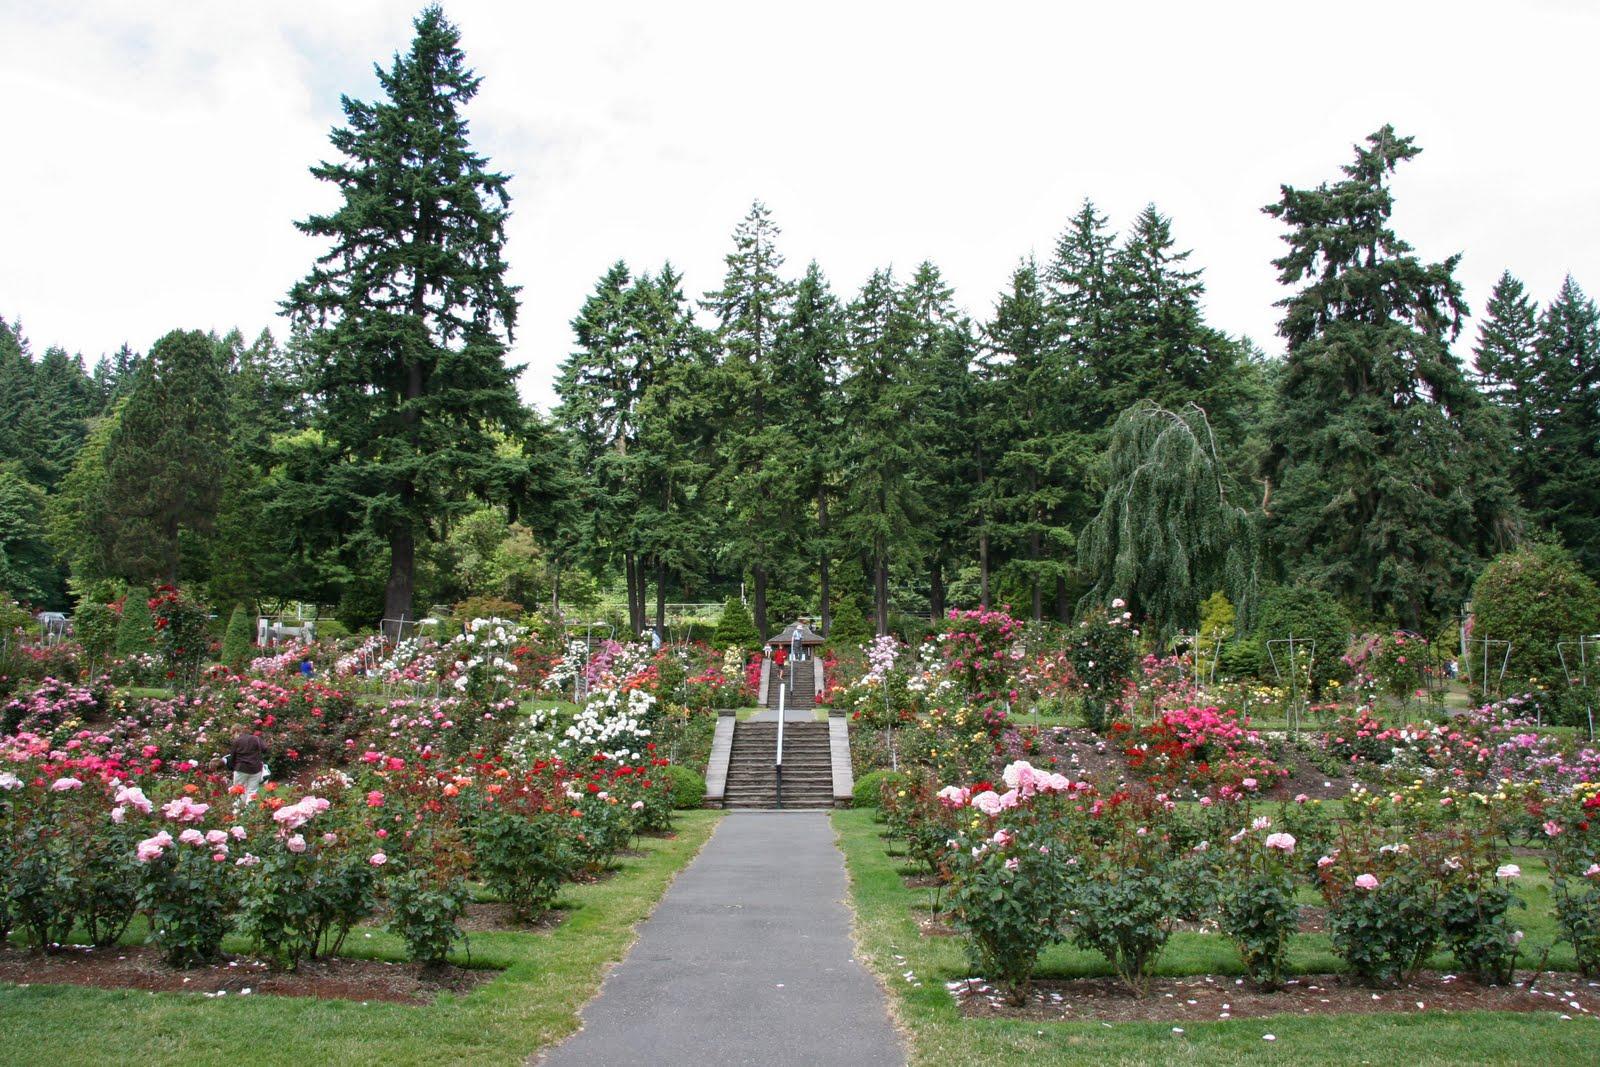 Daffodils Daydreams Garden Visit International Rose Test Garden In Portland Oregon